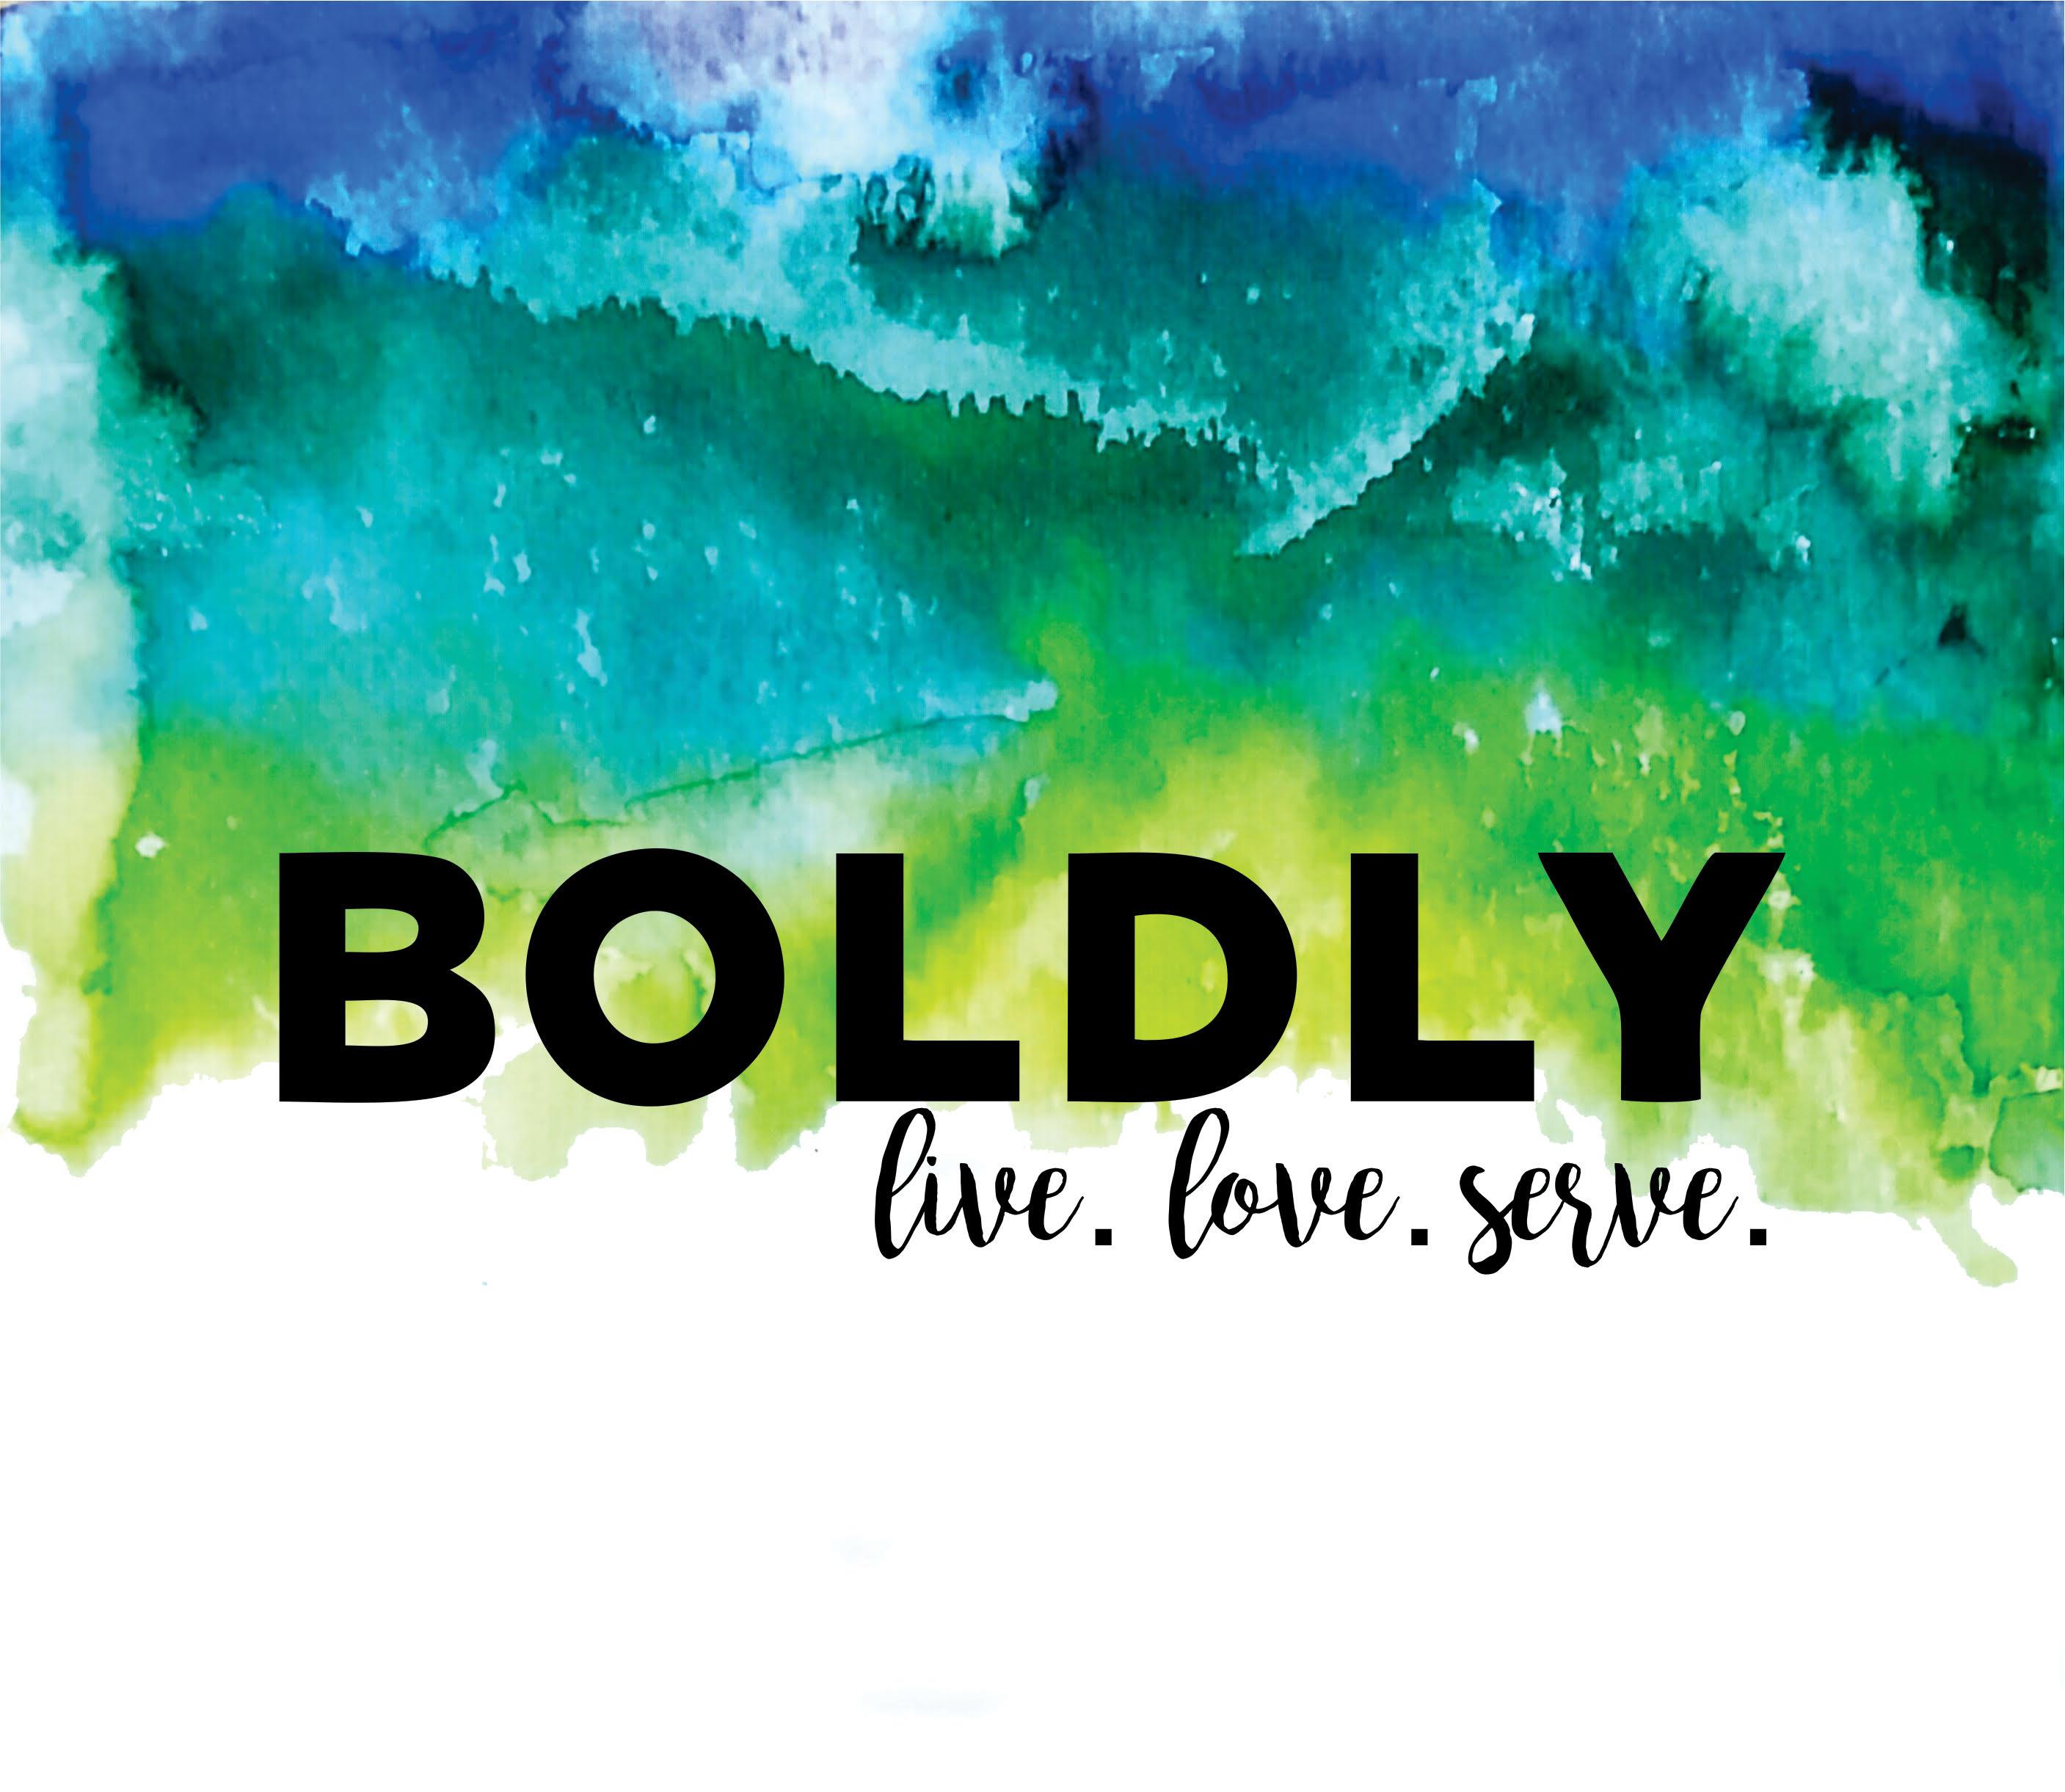 Boldly 2017 retreat logo